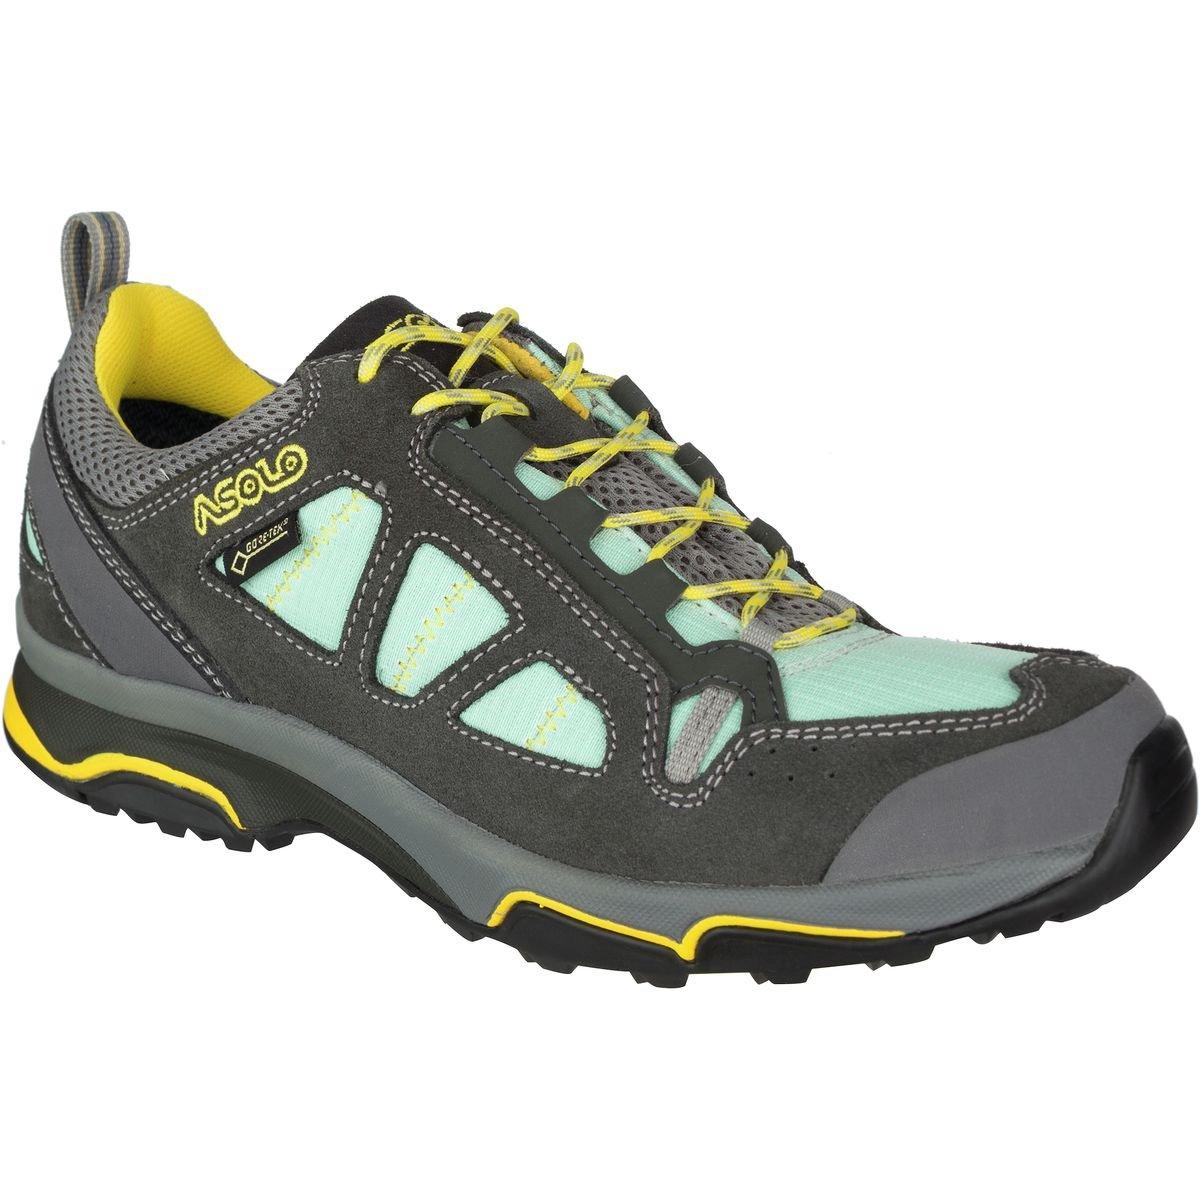 Asolo Megaton GV GTX Hiking Shoe - Women's-Graphite/Pool A40011-Graphite/Pool Side-6.5 by Asolo (Image #2)